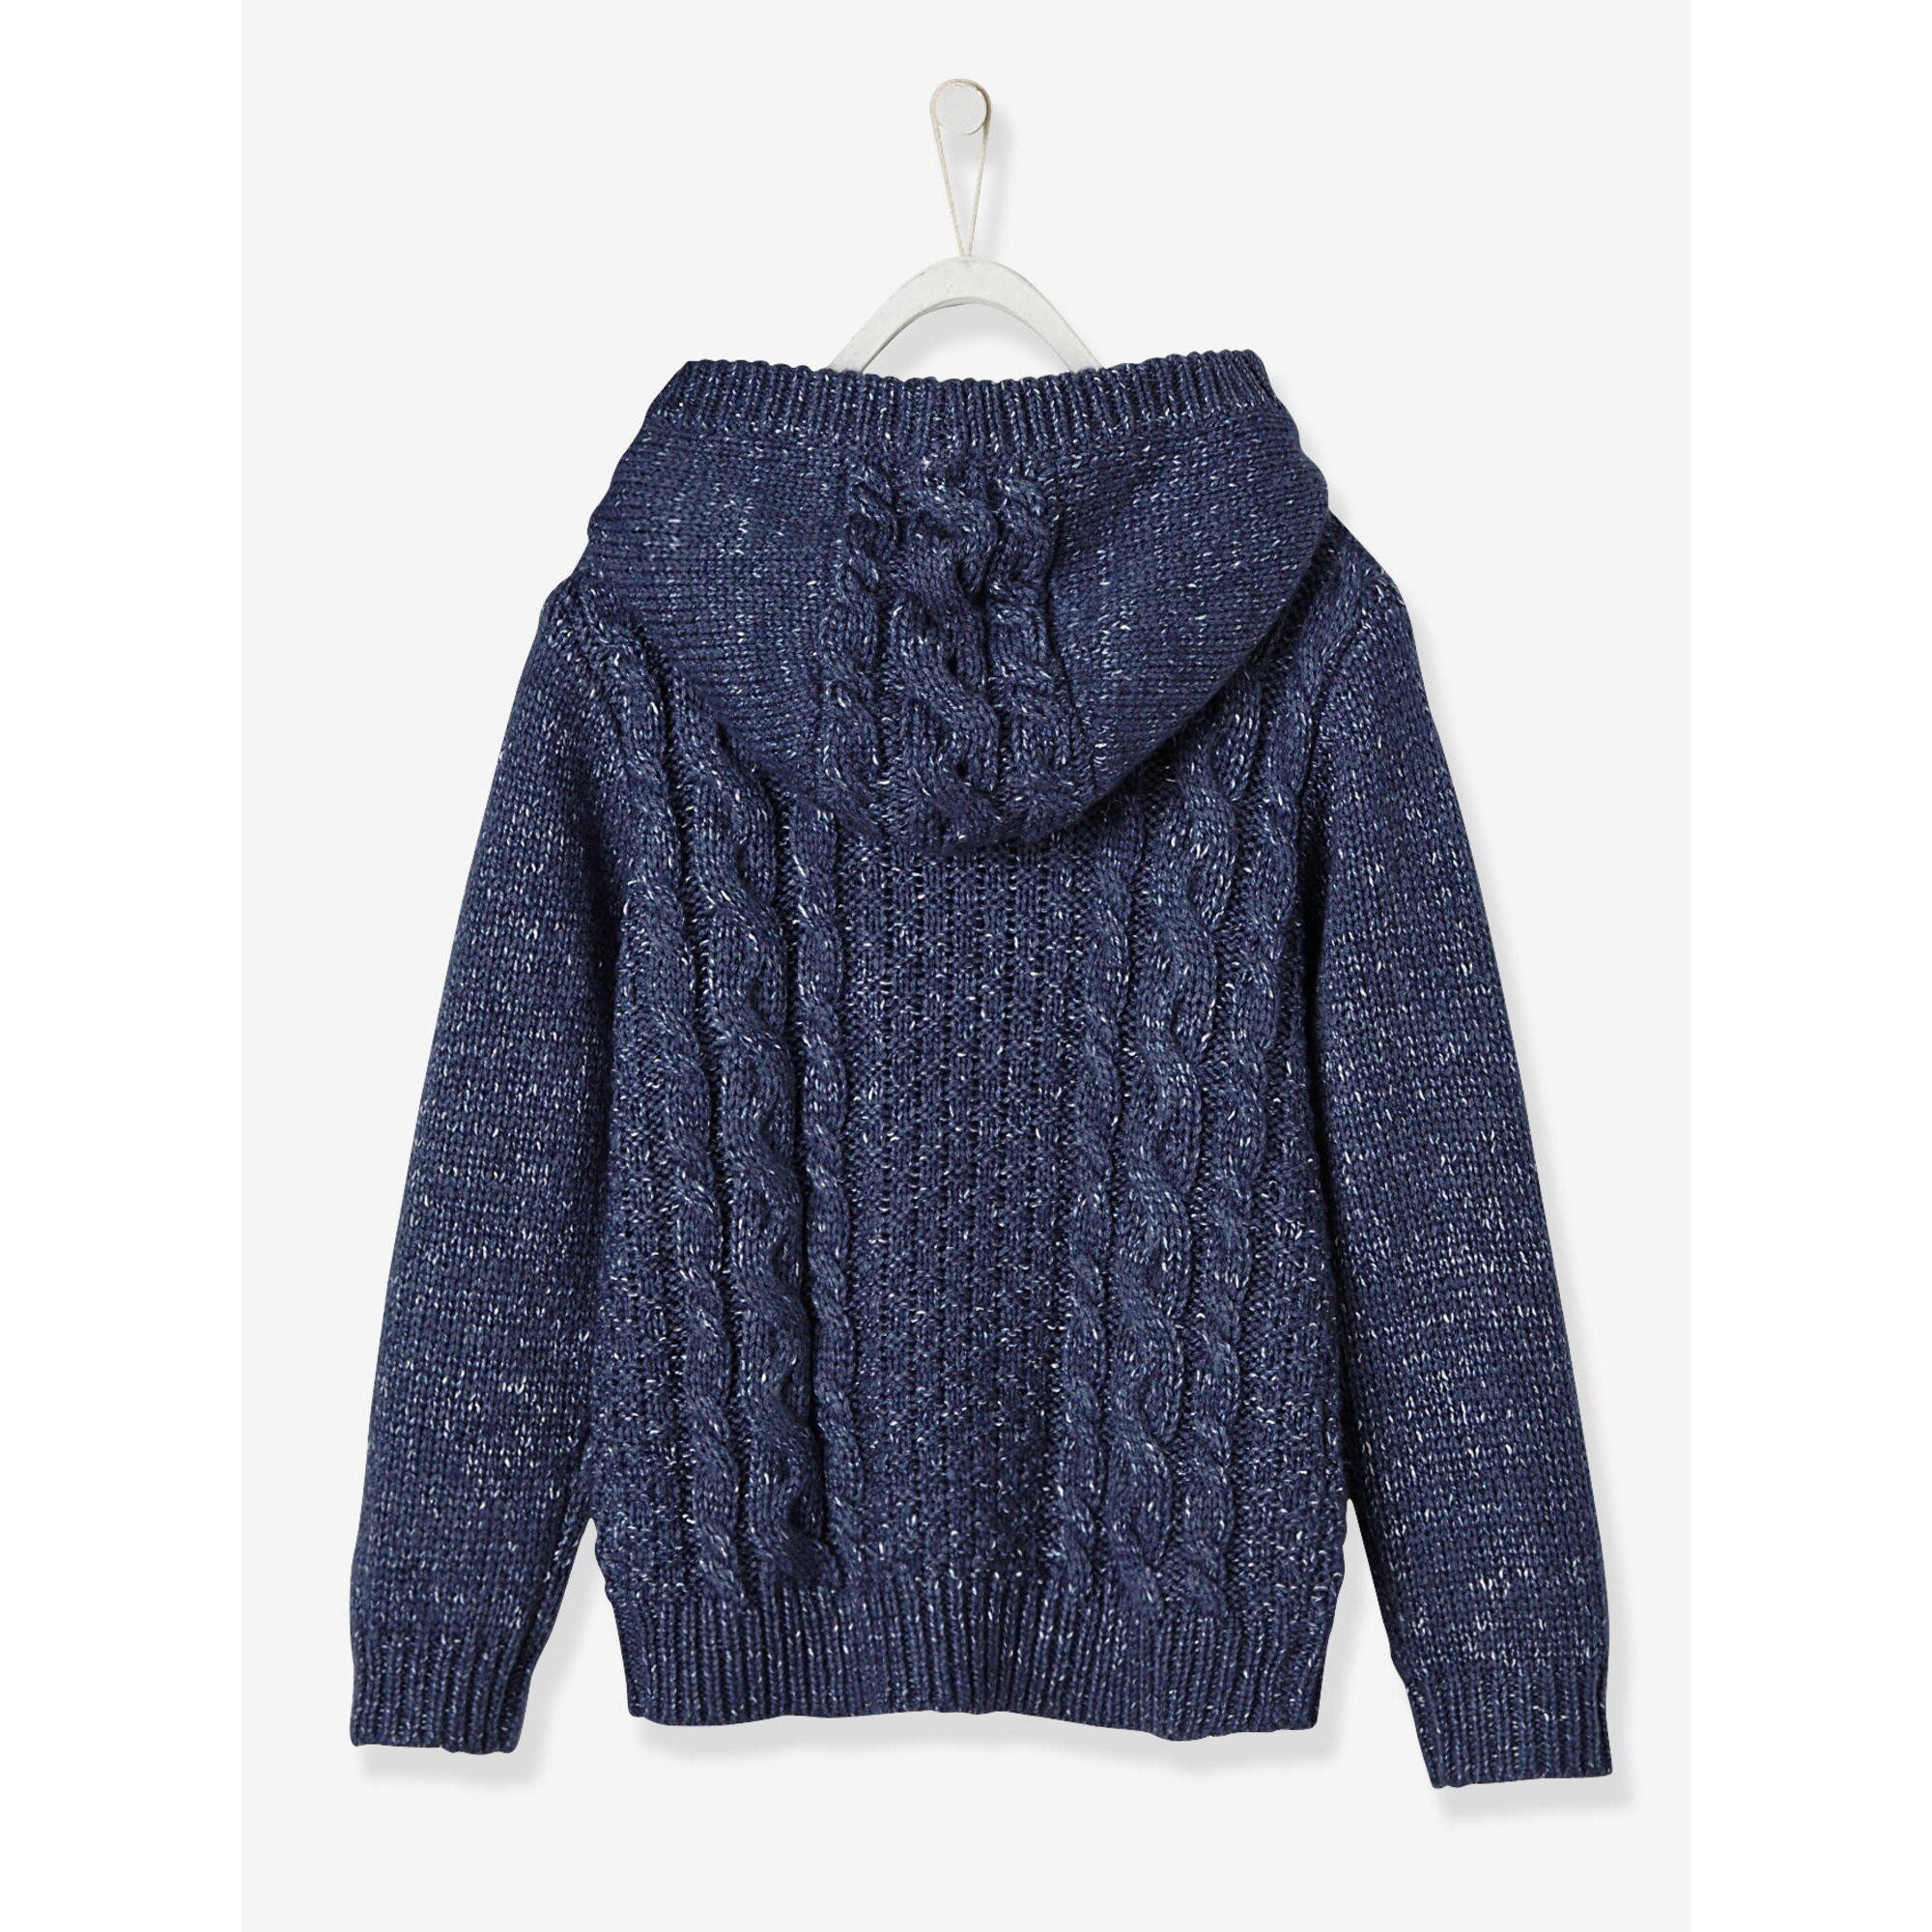 vertbaudet-jungen-kapuzen-pullover